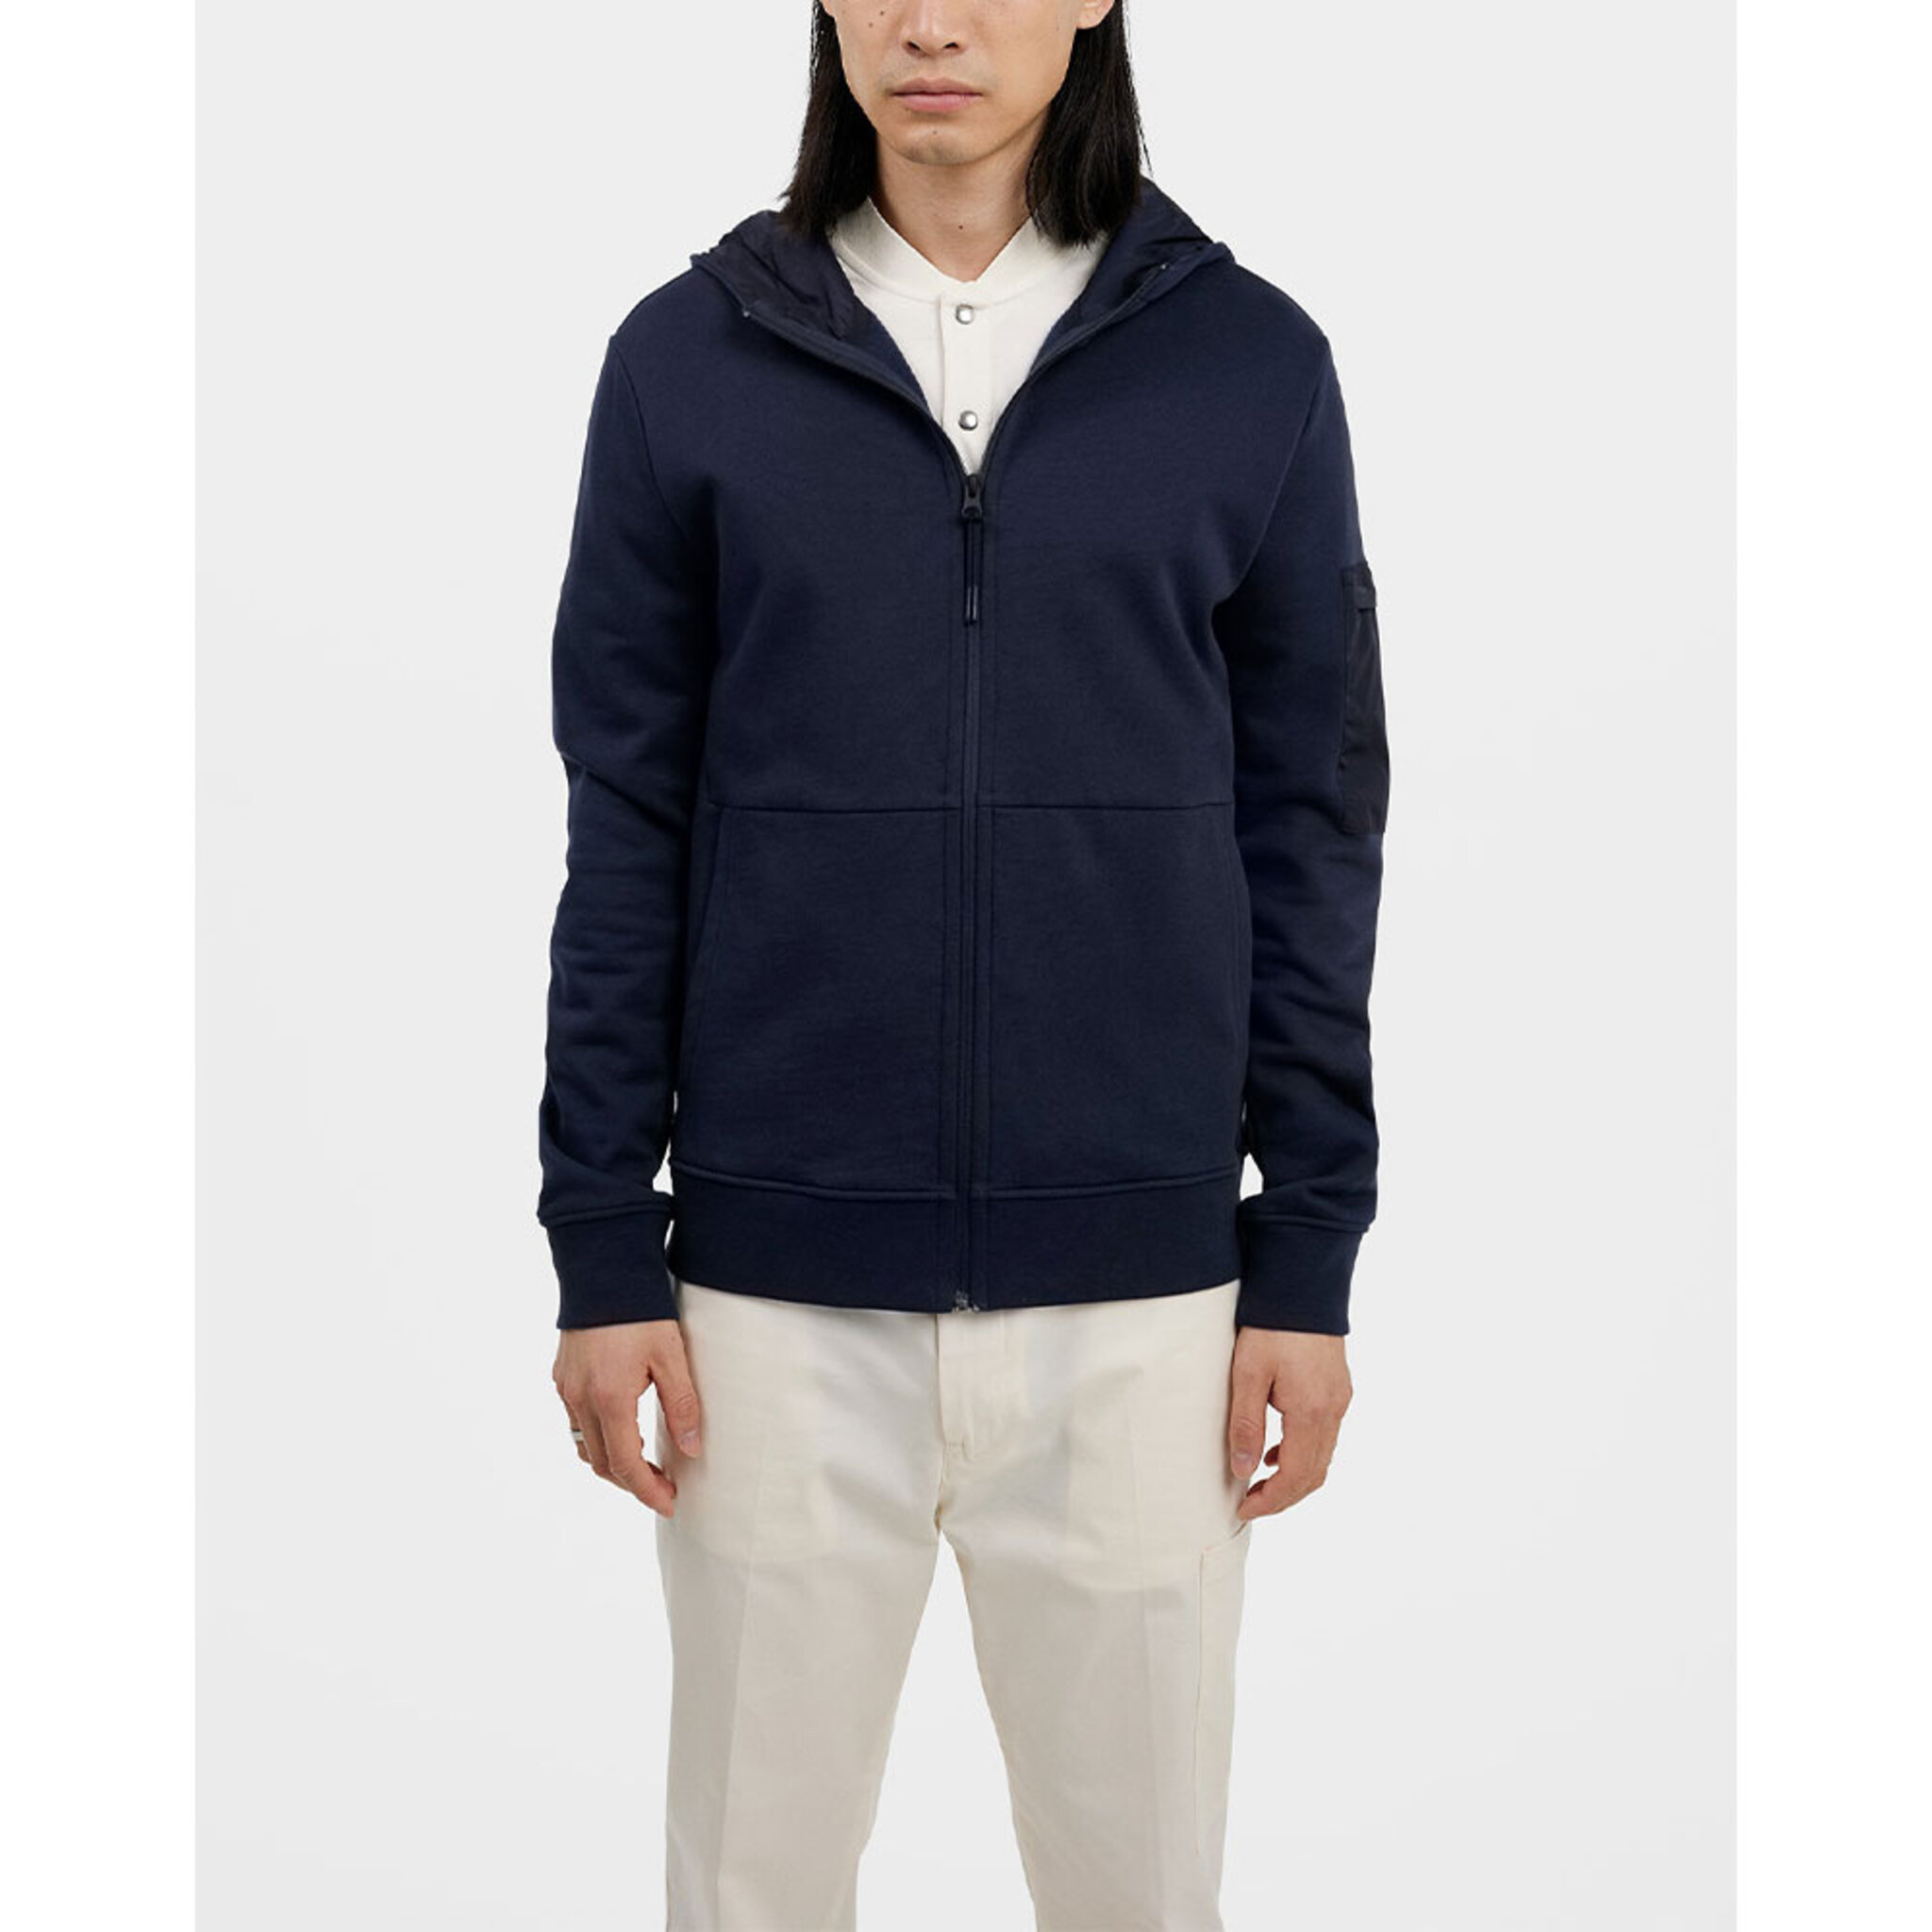 Faron Hood Jacket Sweater